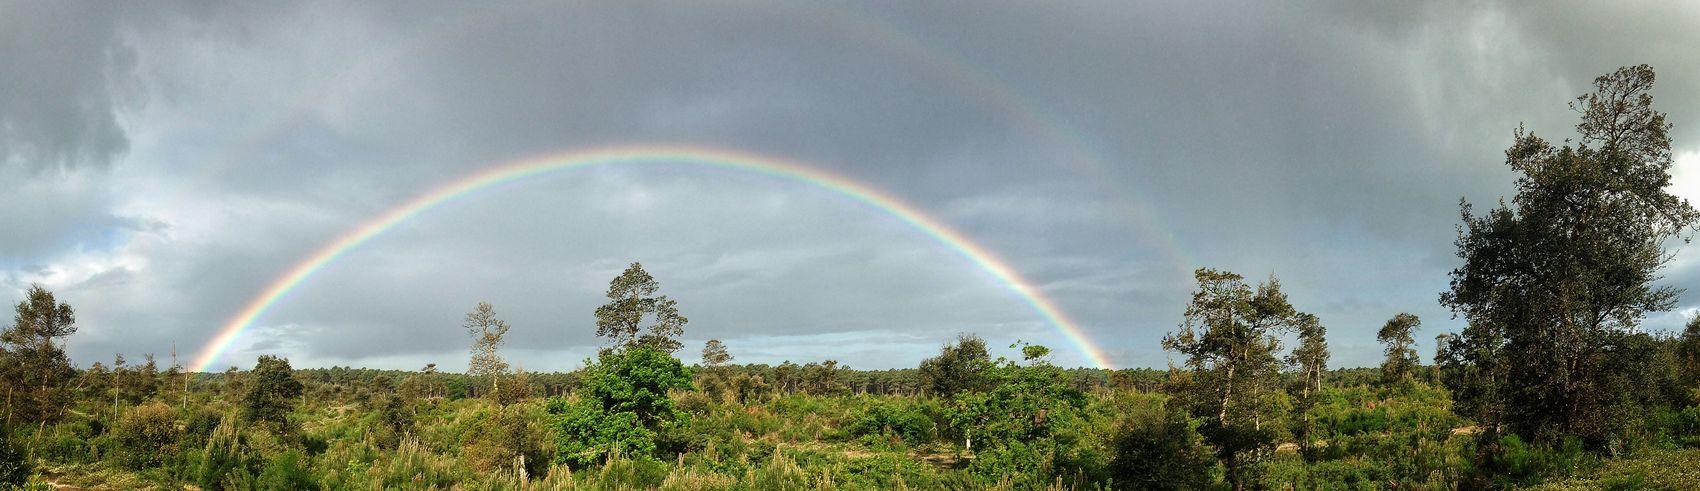 Contis Landes Aquitaine Rainbow arc en ciel Contis Plage